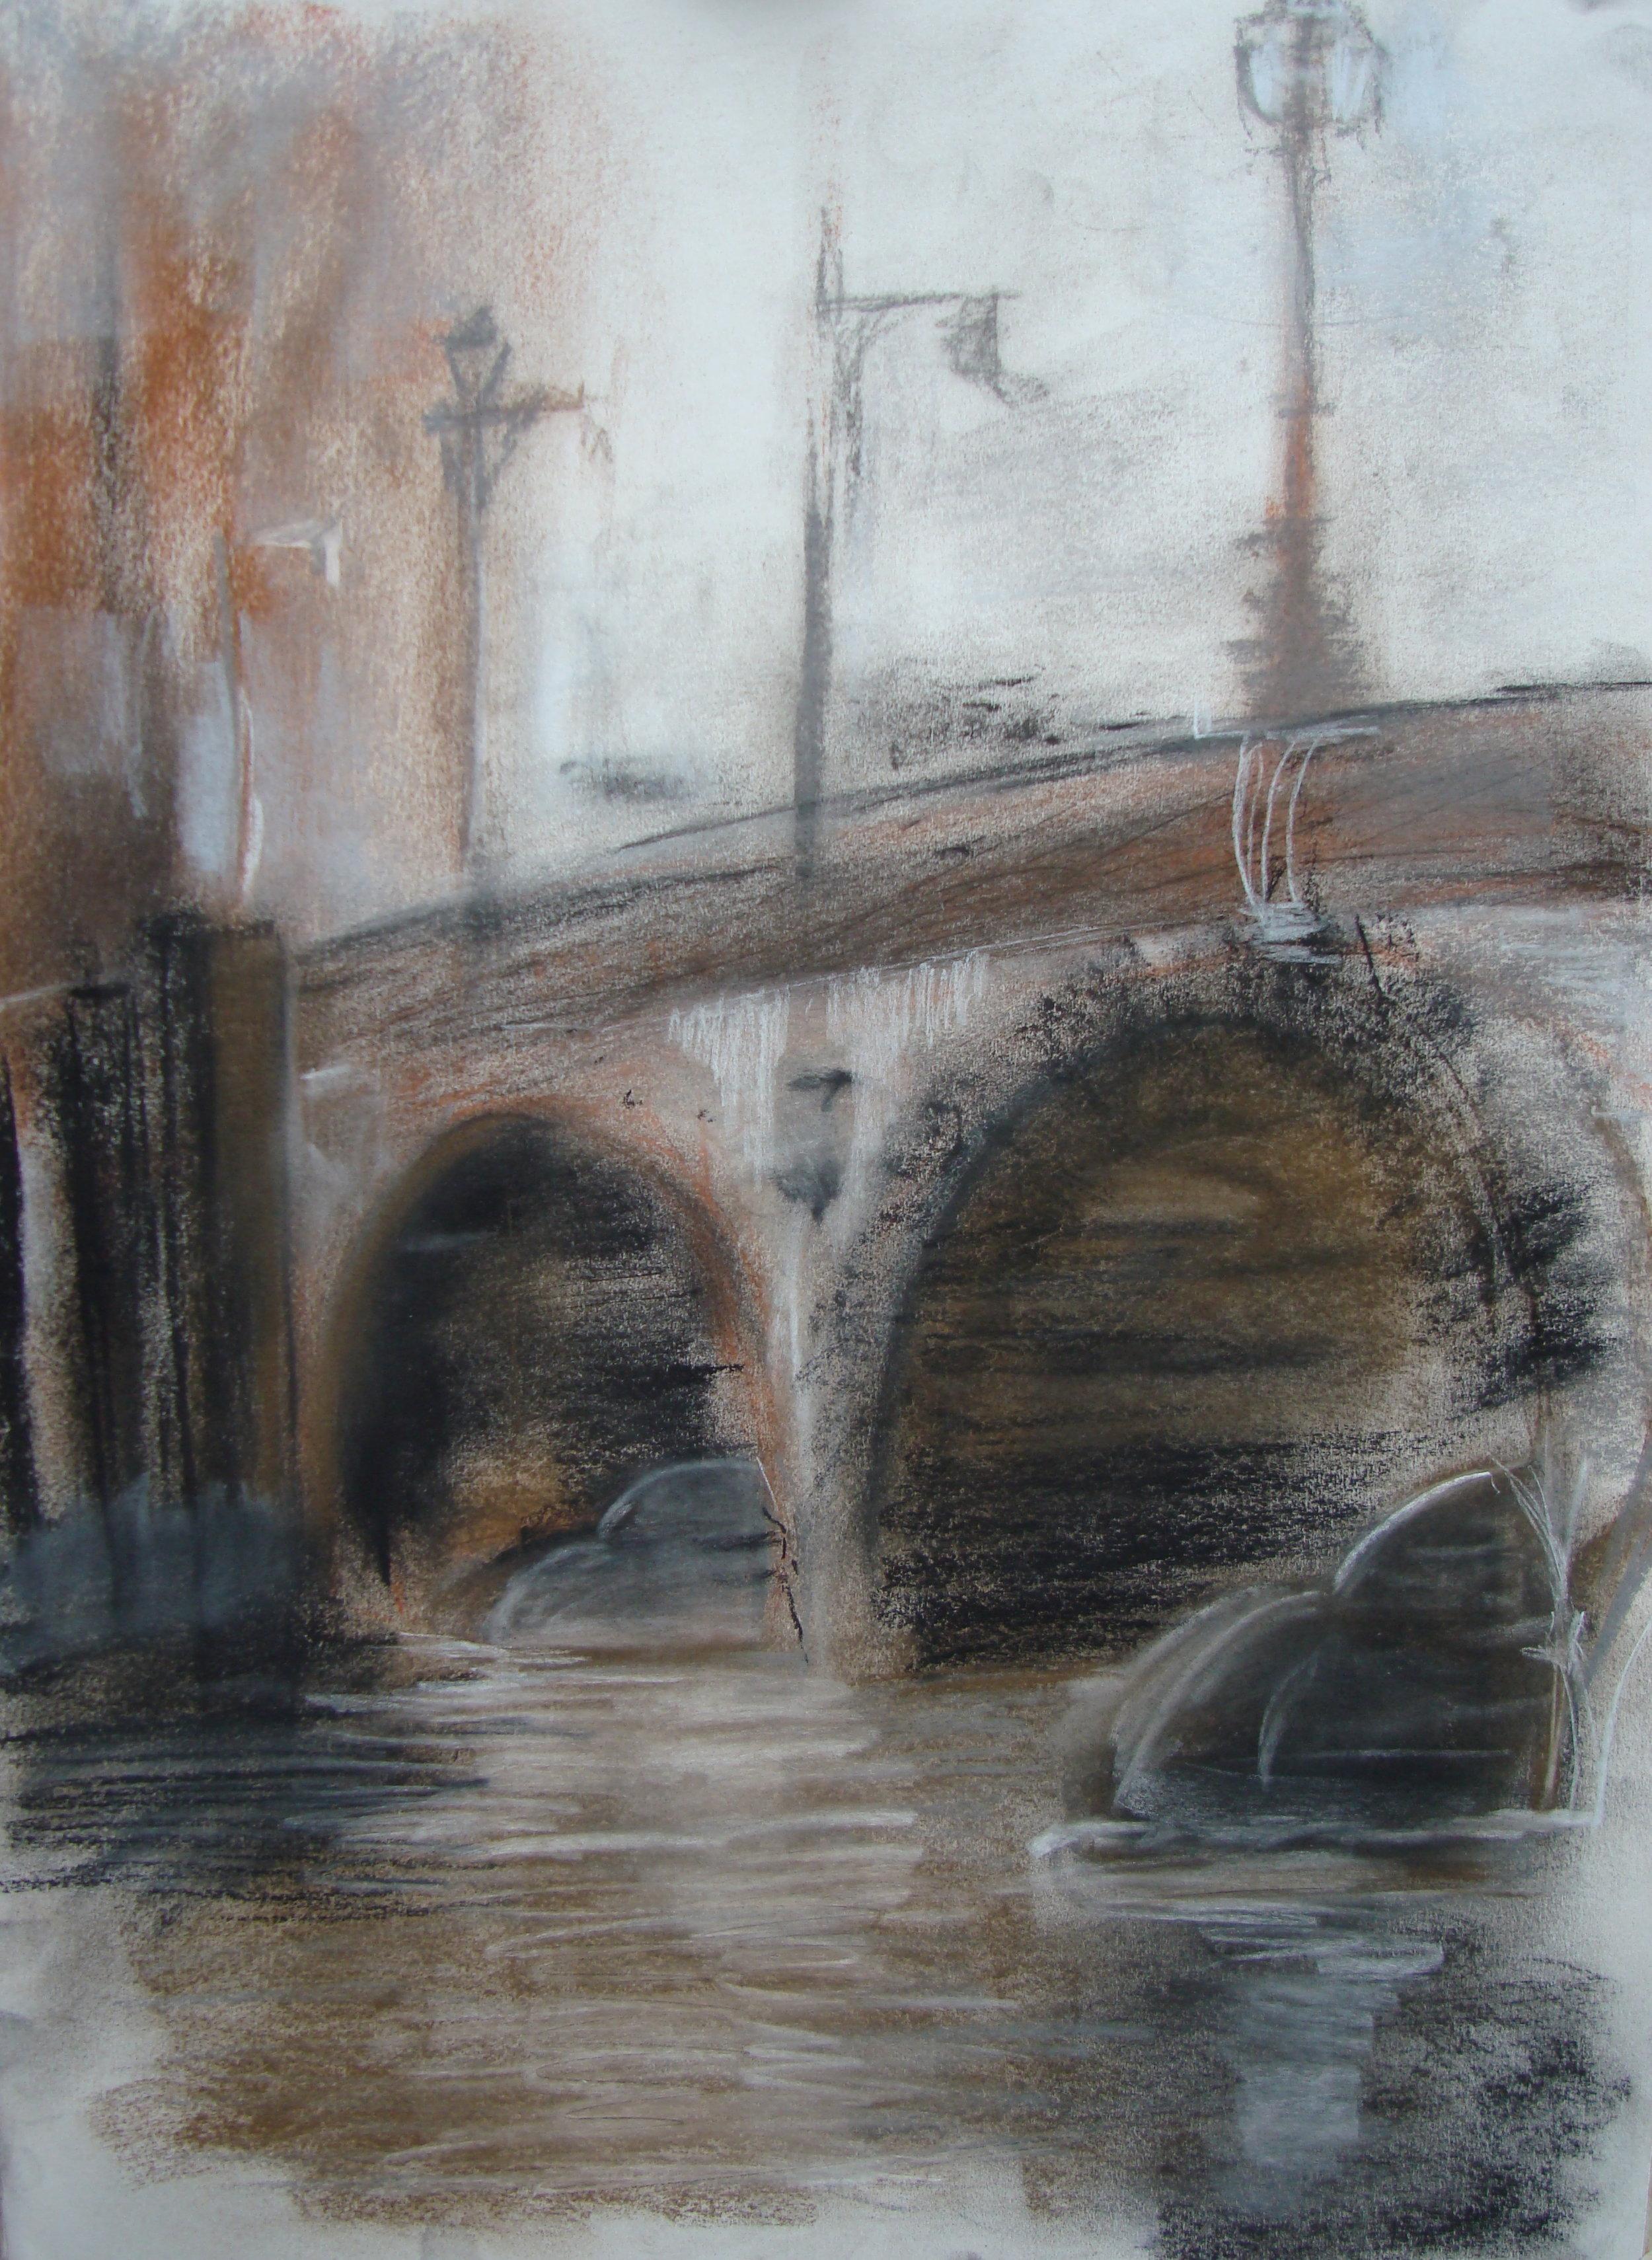 Kew Bridge Arches, Jan Marshall